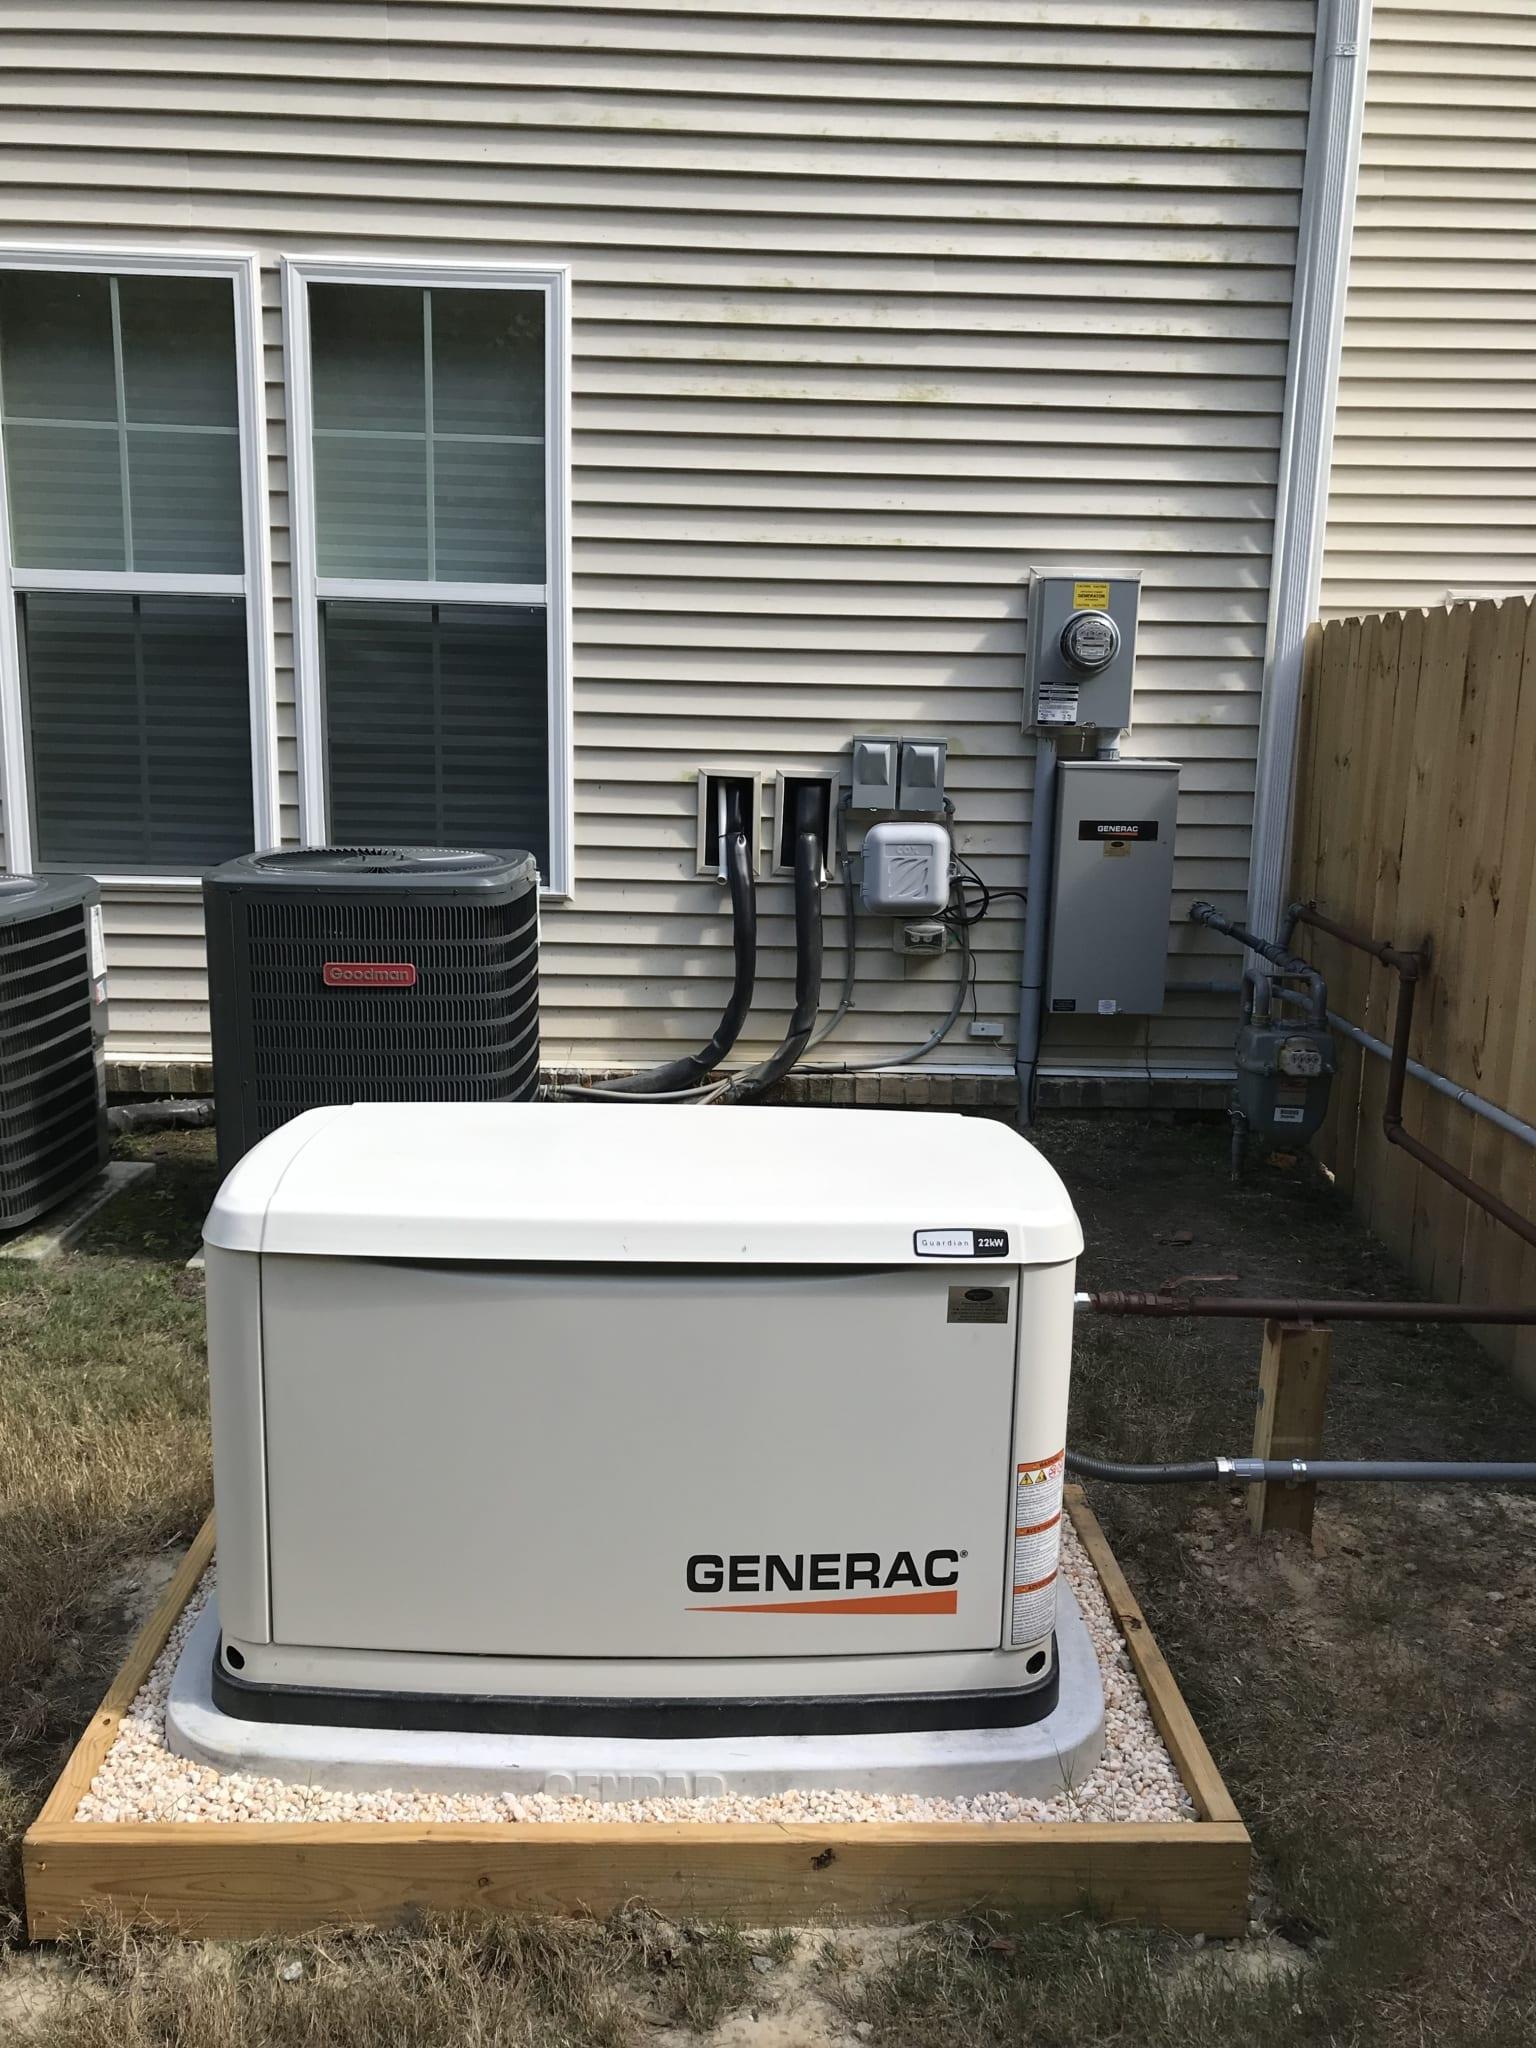 9.19.19 James City Generac Automtic Standby Generator